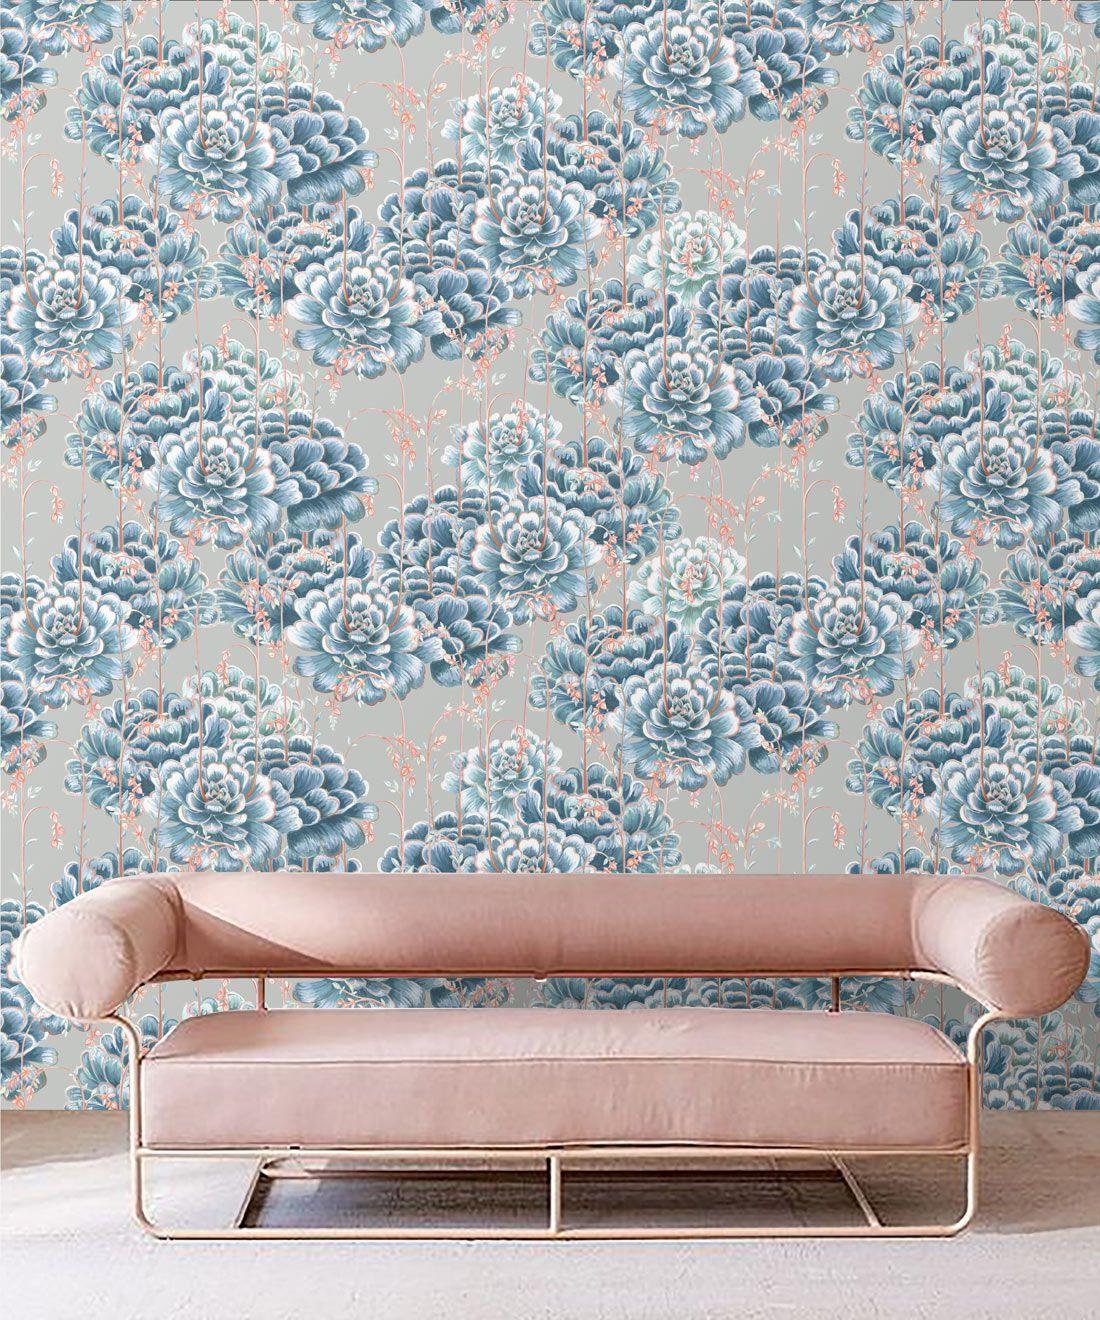 Succulents Wallpaper Steel Blue • Cactus Wallpaper • Desert Wallpaper Insitu on grey background behind pink sofa